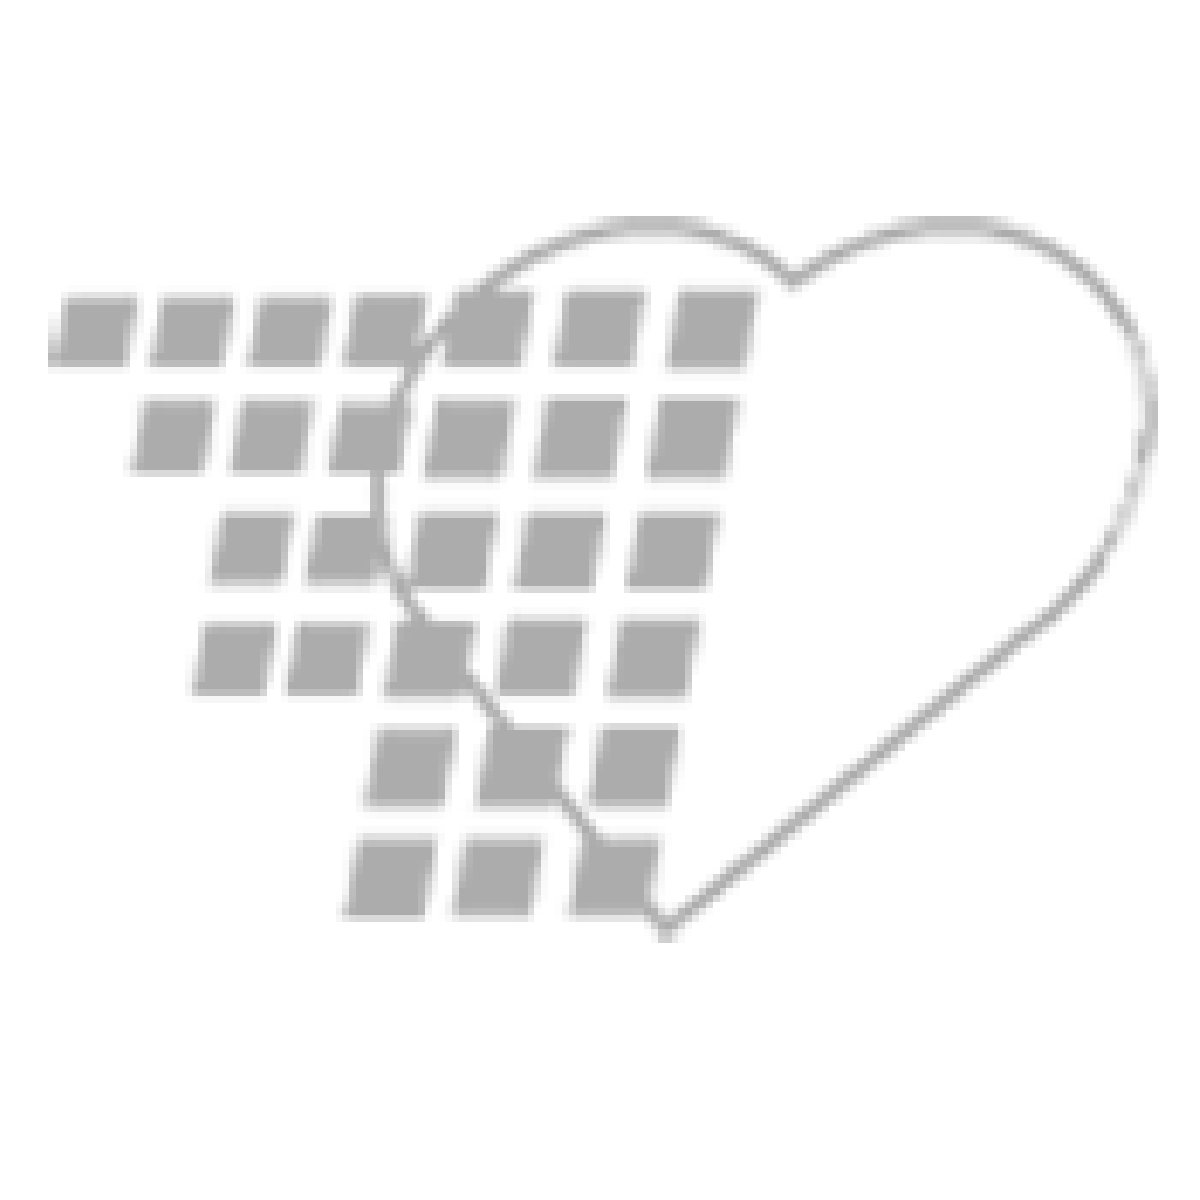 02-38-7145 Chemstrip® 10 SG